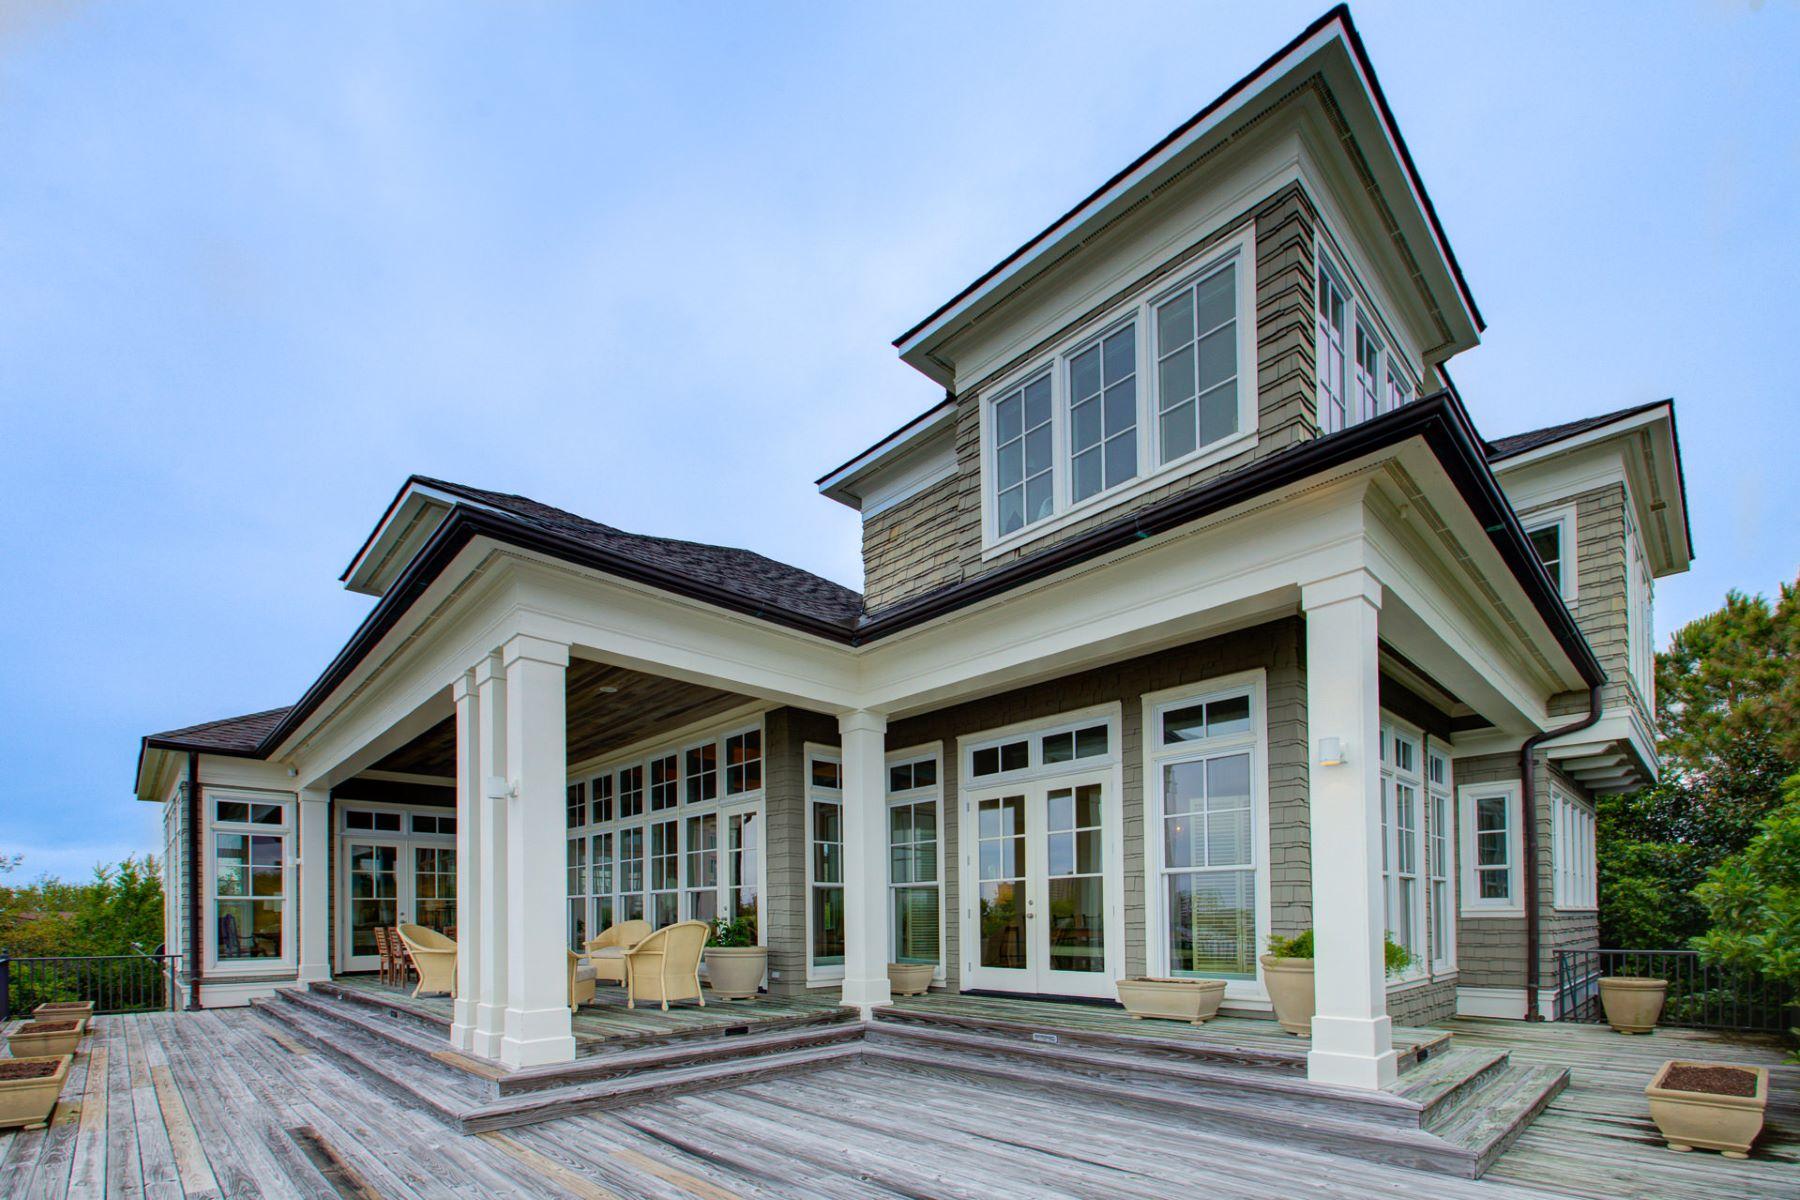 Single Family Home for Active at Ono Island 29814 Ono Blvd Orange Beach, Alabama 36561 United States